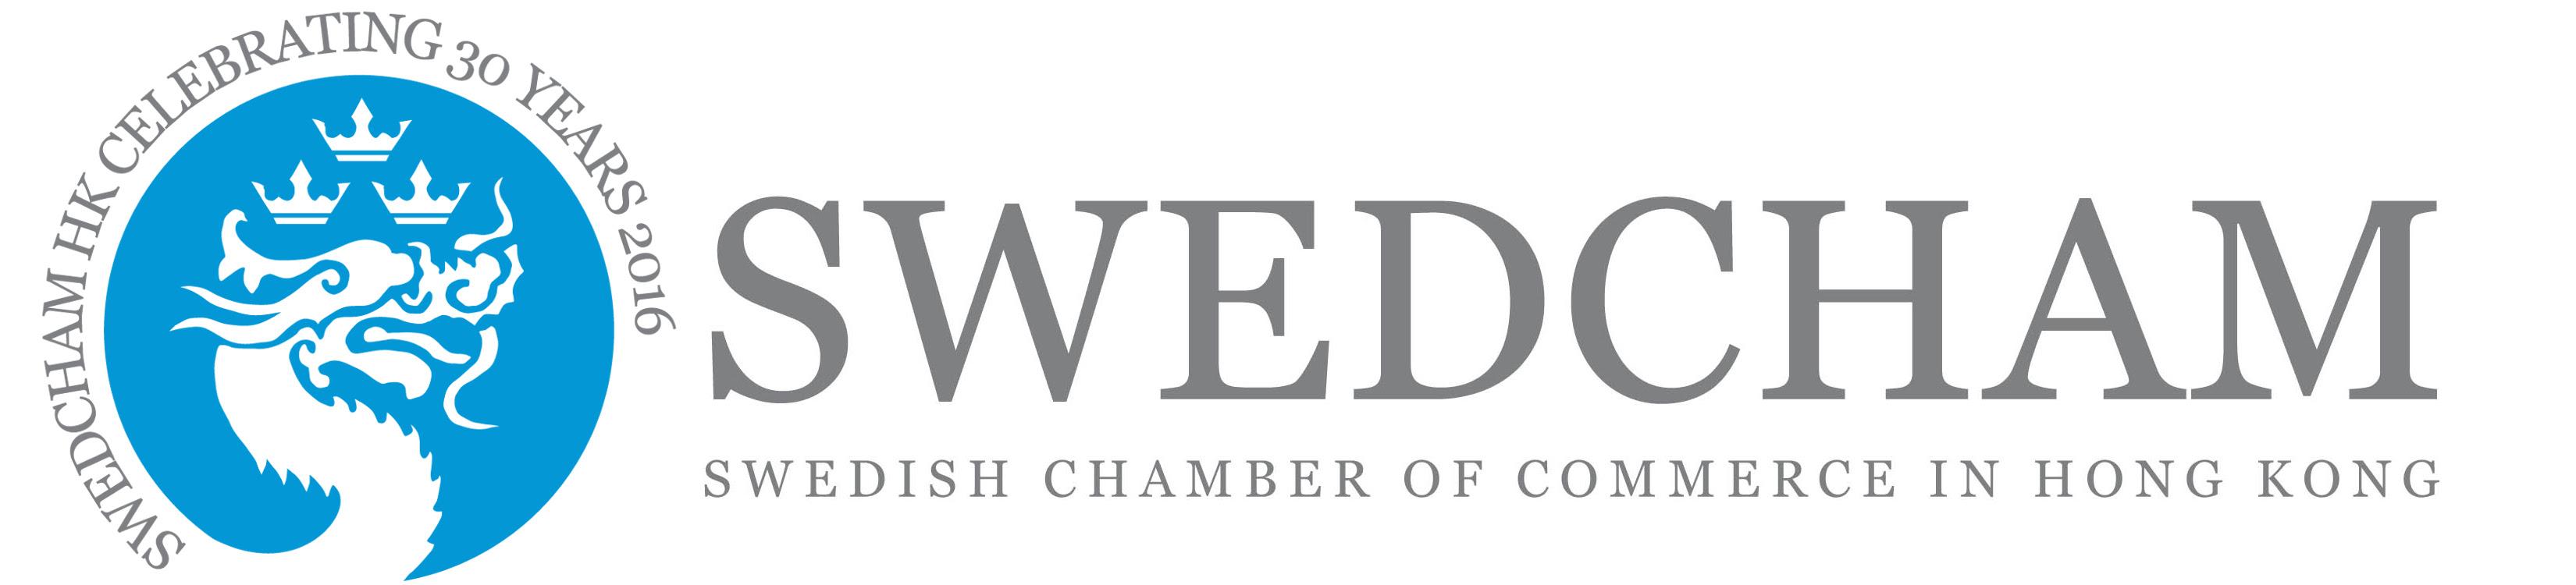 Swedcham-hong-kong-logo